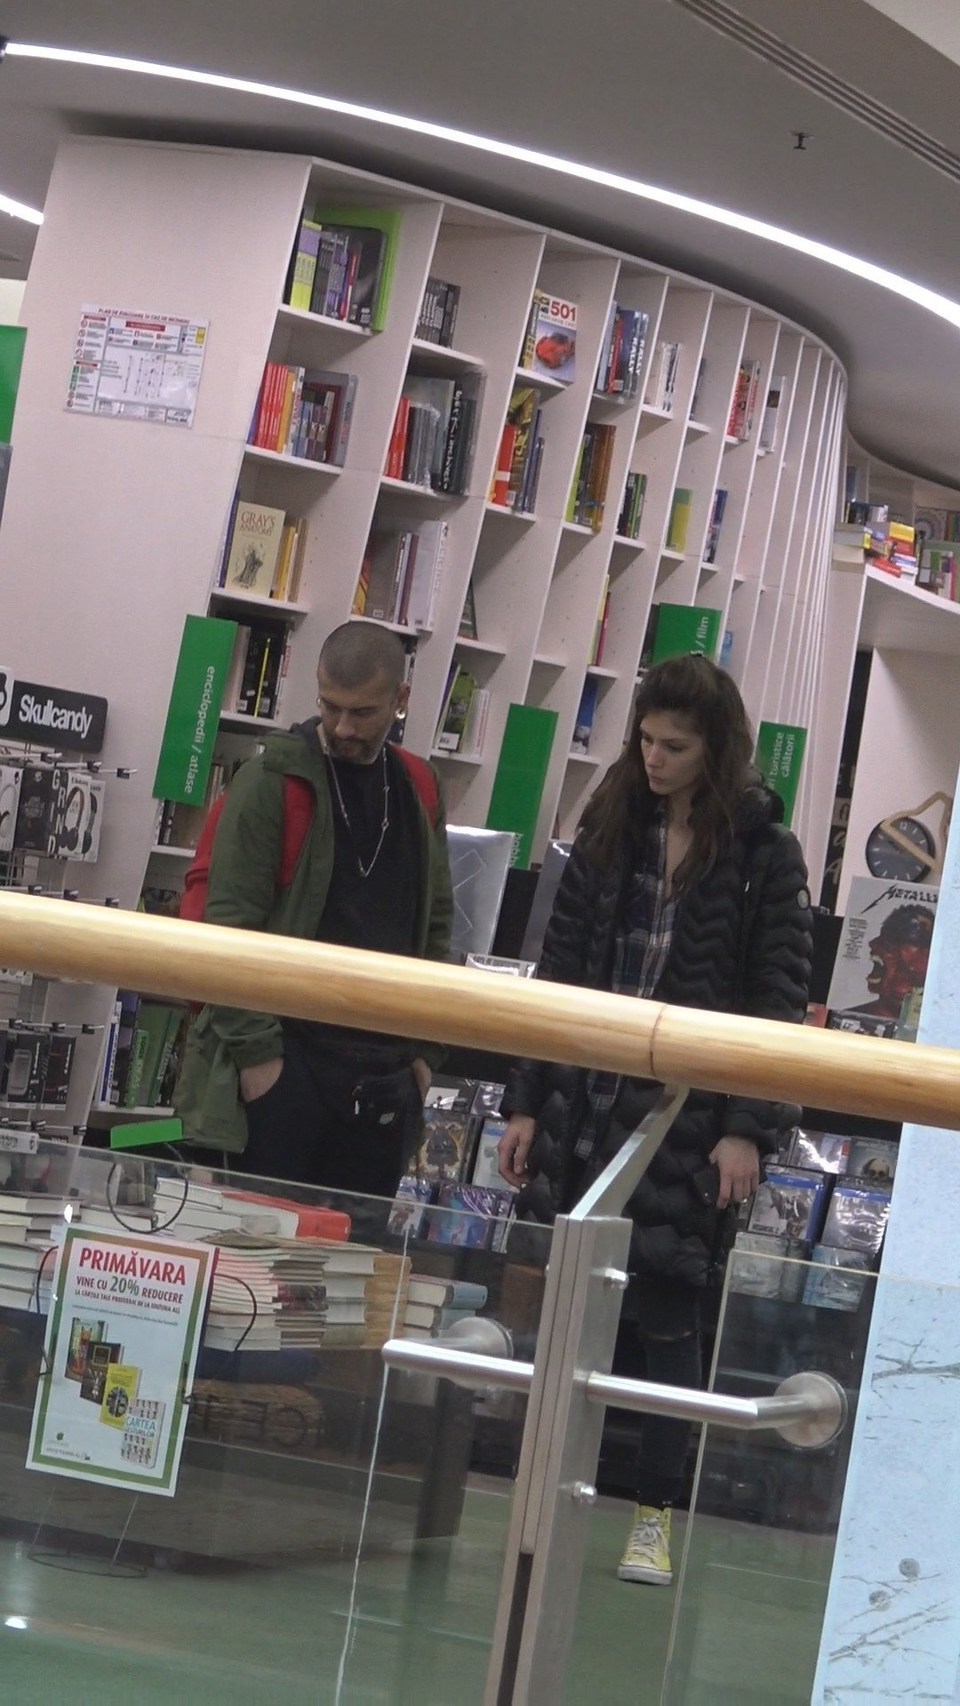 Vali Barbulescu si-a scos iubita la o plimbare prin... biblioteca! Delia iese in evidenta si atunci cand este imbracata gros | VIDEO